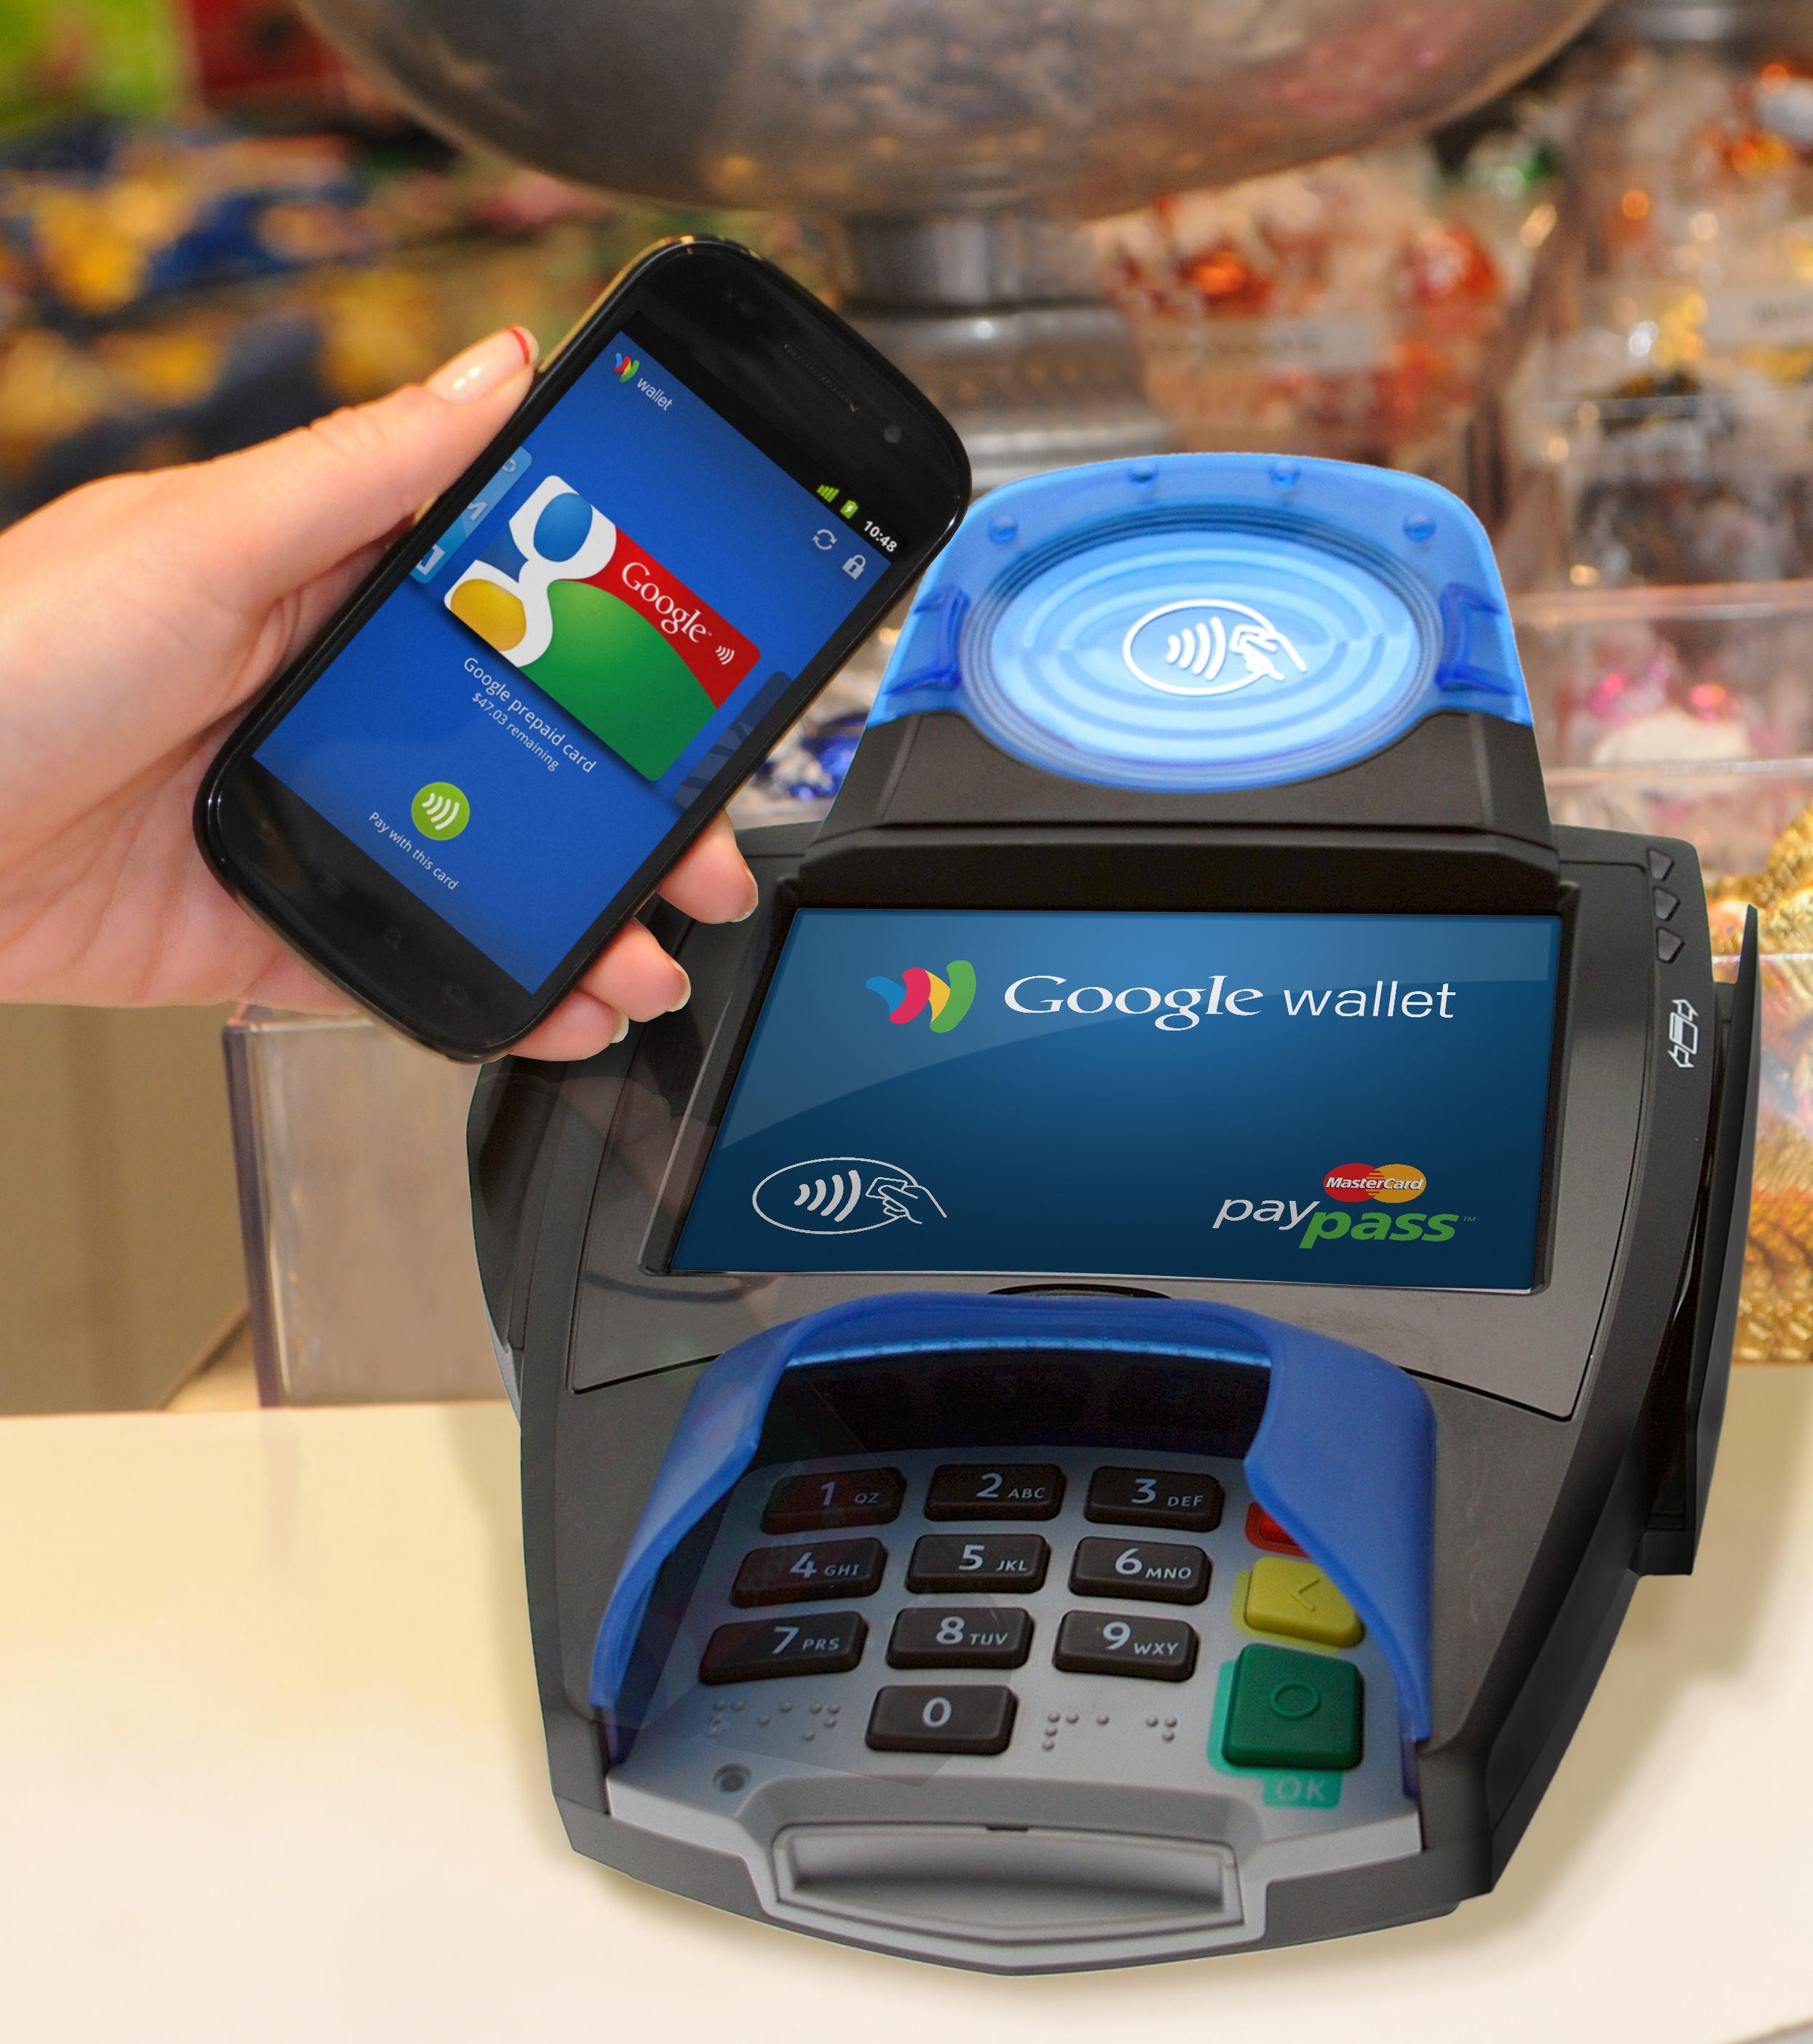 Rumored Q1 Google Wallet Pilot in UK is Unlikely